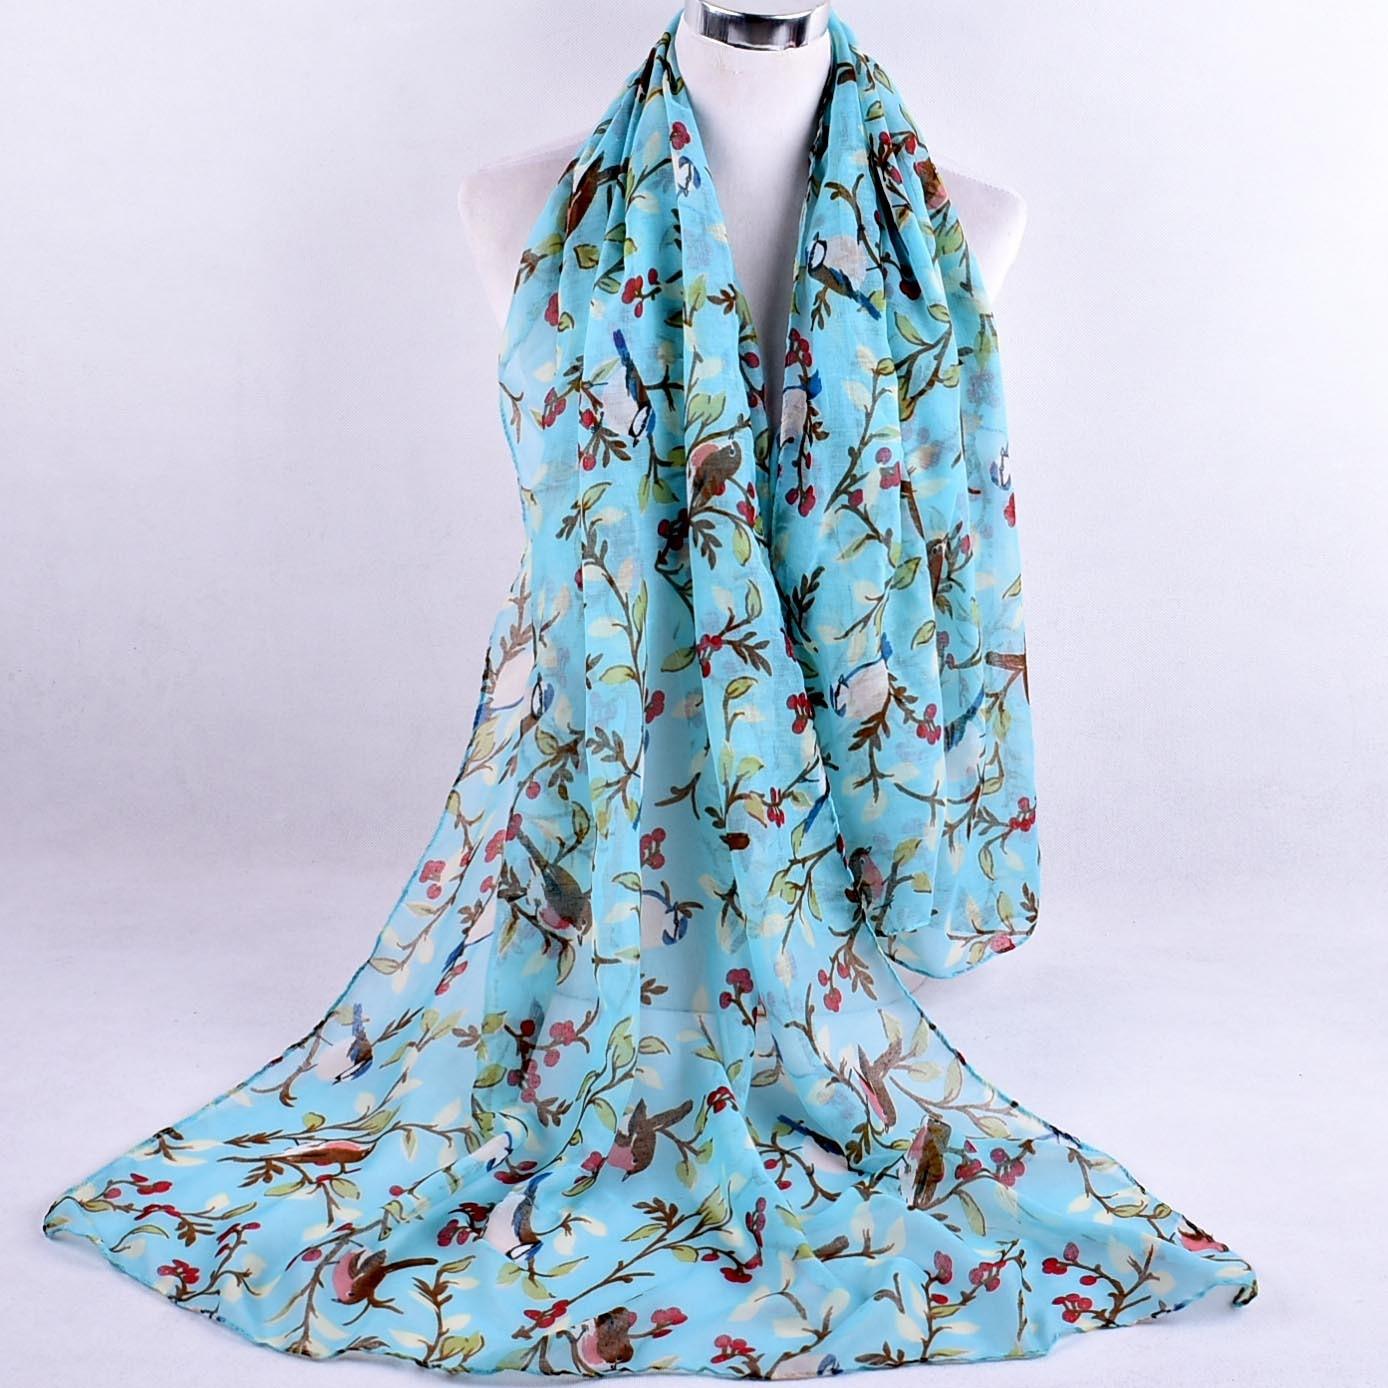 German Fashion Brand Women's High Quality Scarf women's scarves, summer fashion scarves designer scarf women luxury 2019